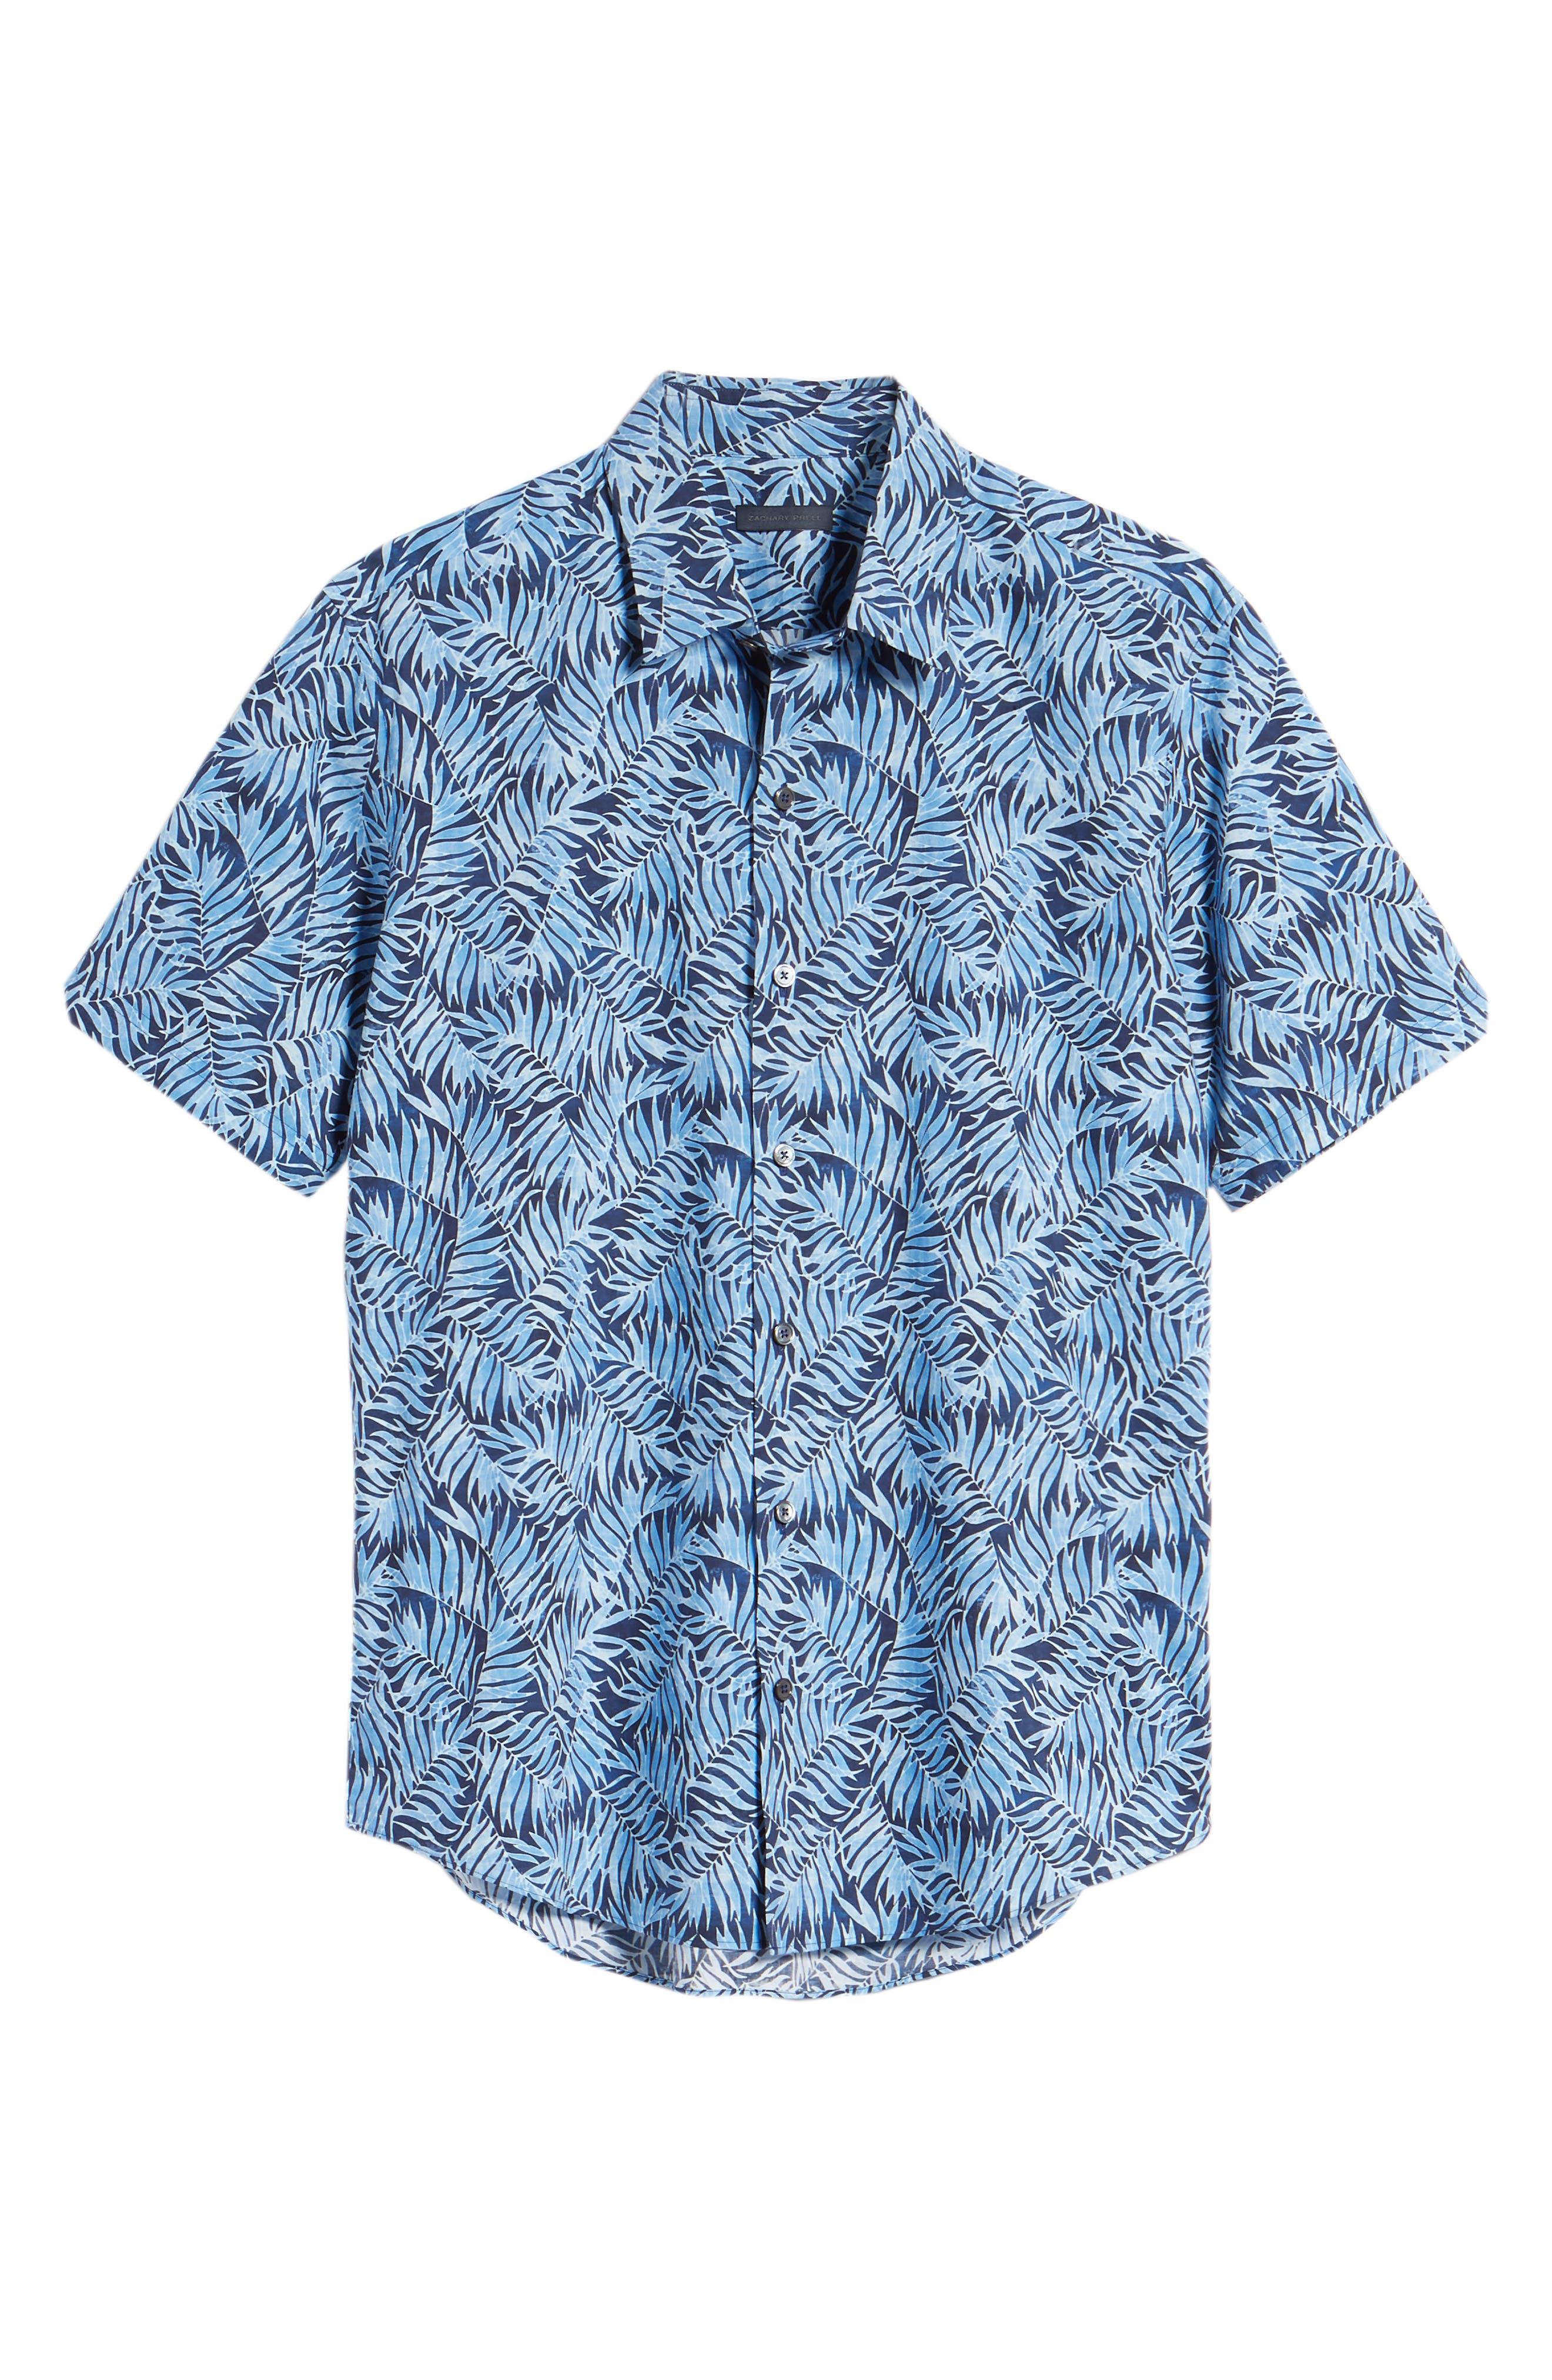 Slack Palm Print Sport Shirt,                             Alternate thumbnail 6, color,                             Navy